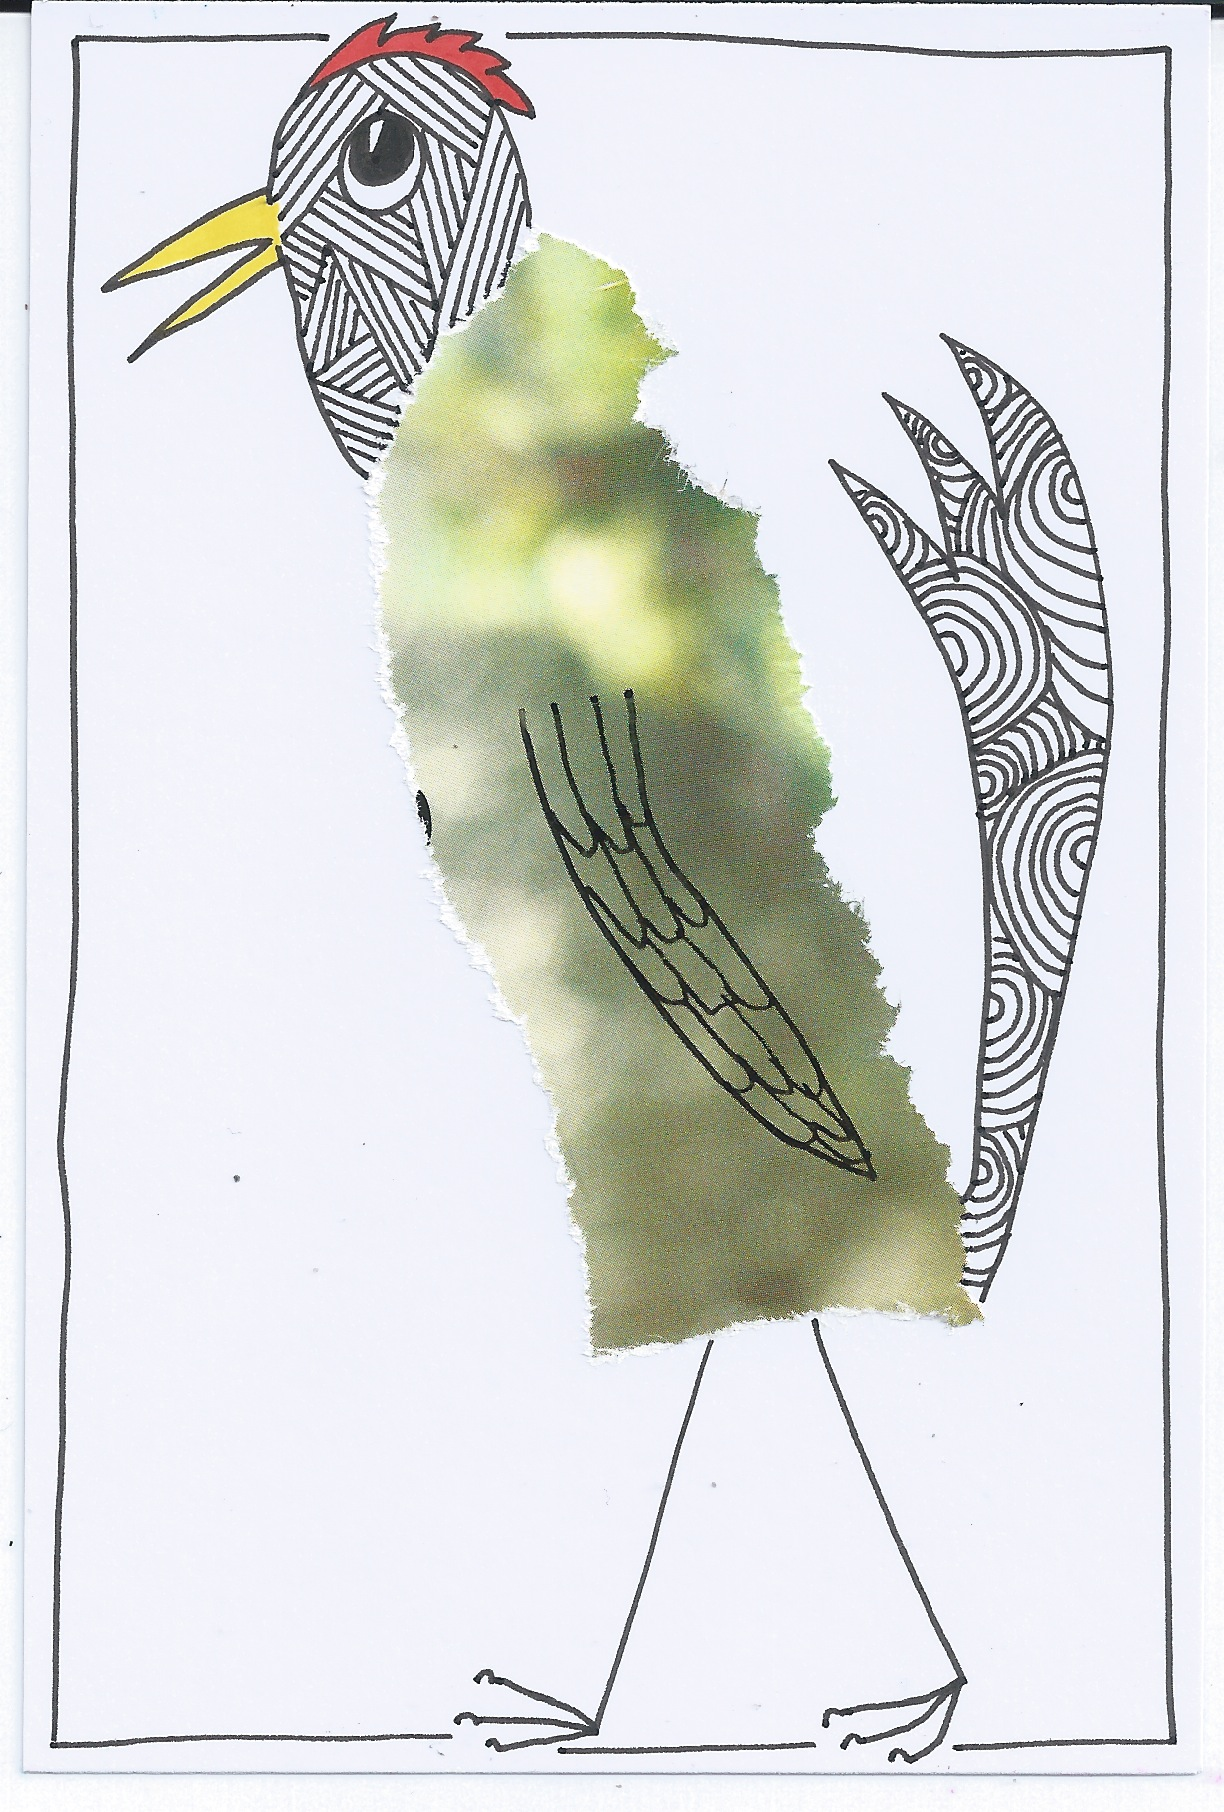 286/365.2 bird leans in